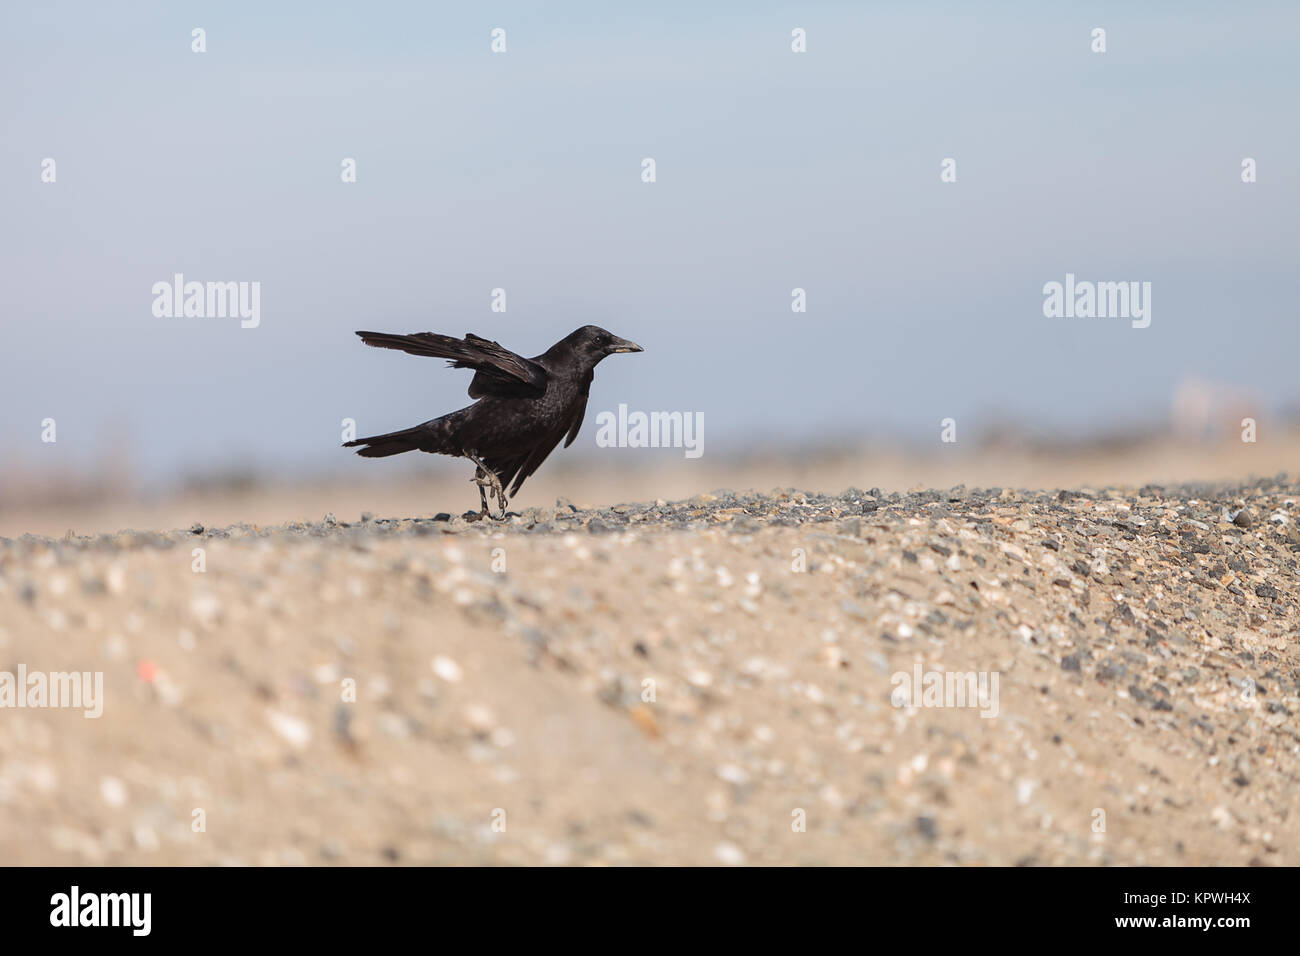 Black raven bird flies across a marsh - Stock Image